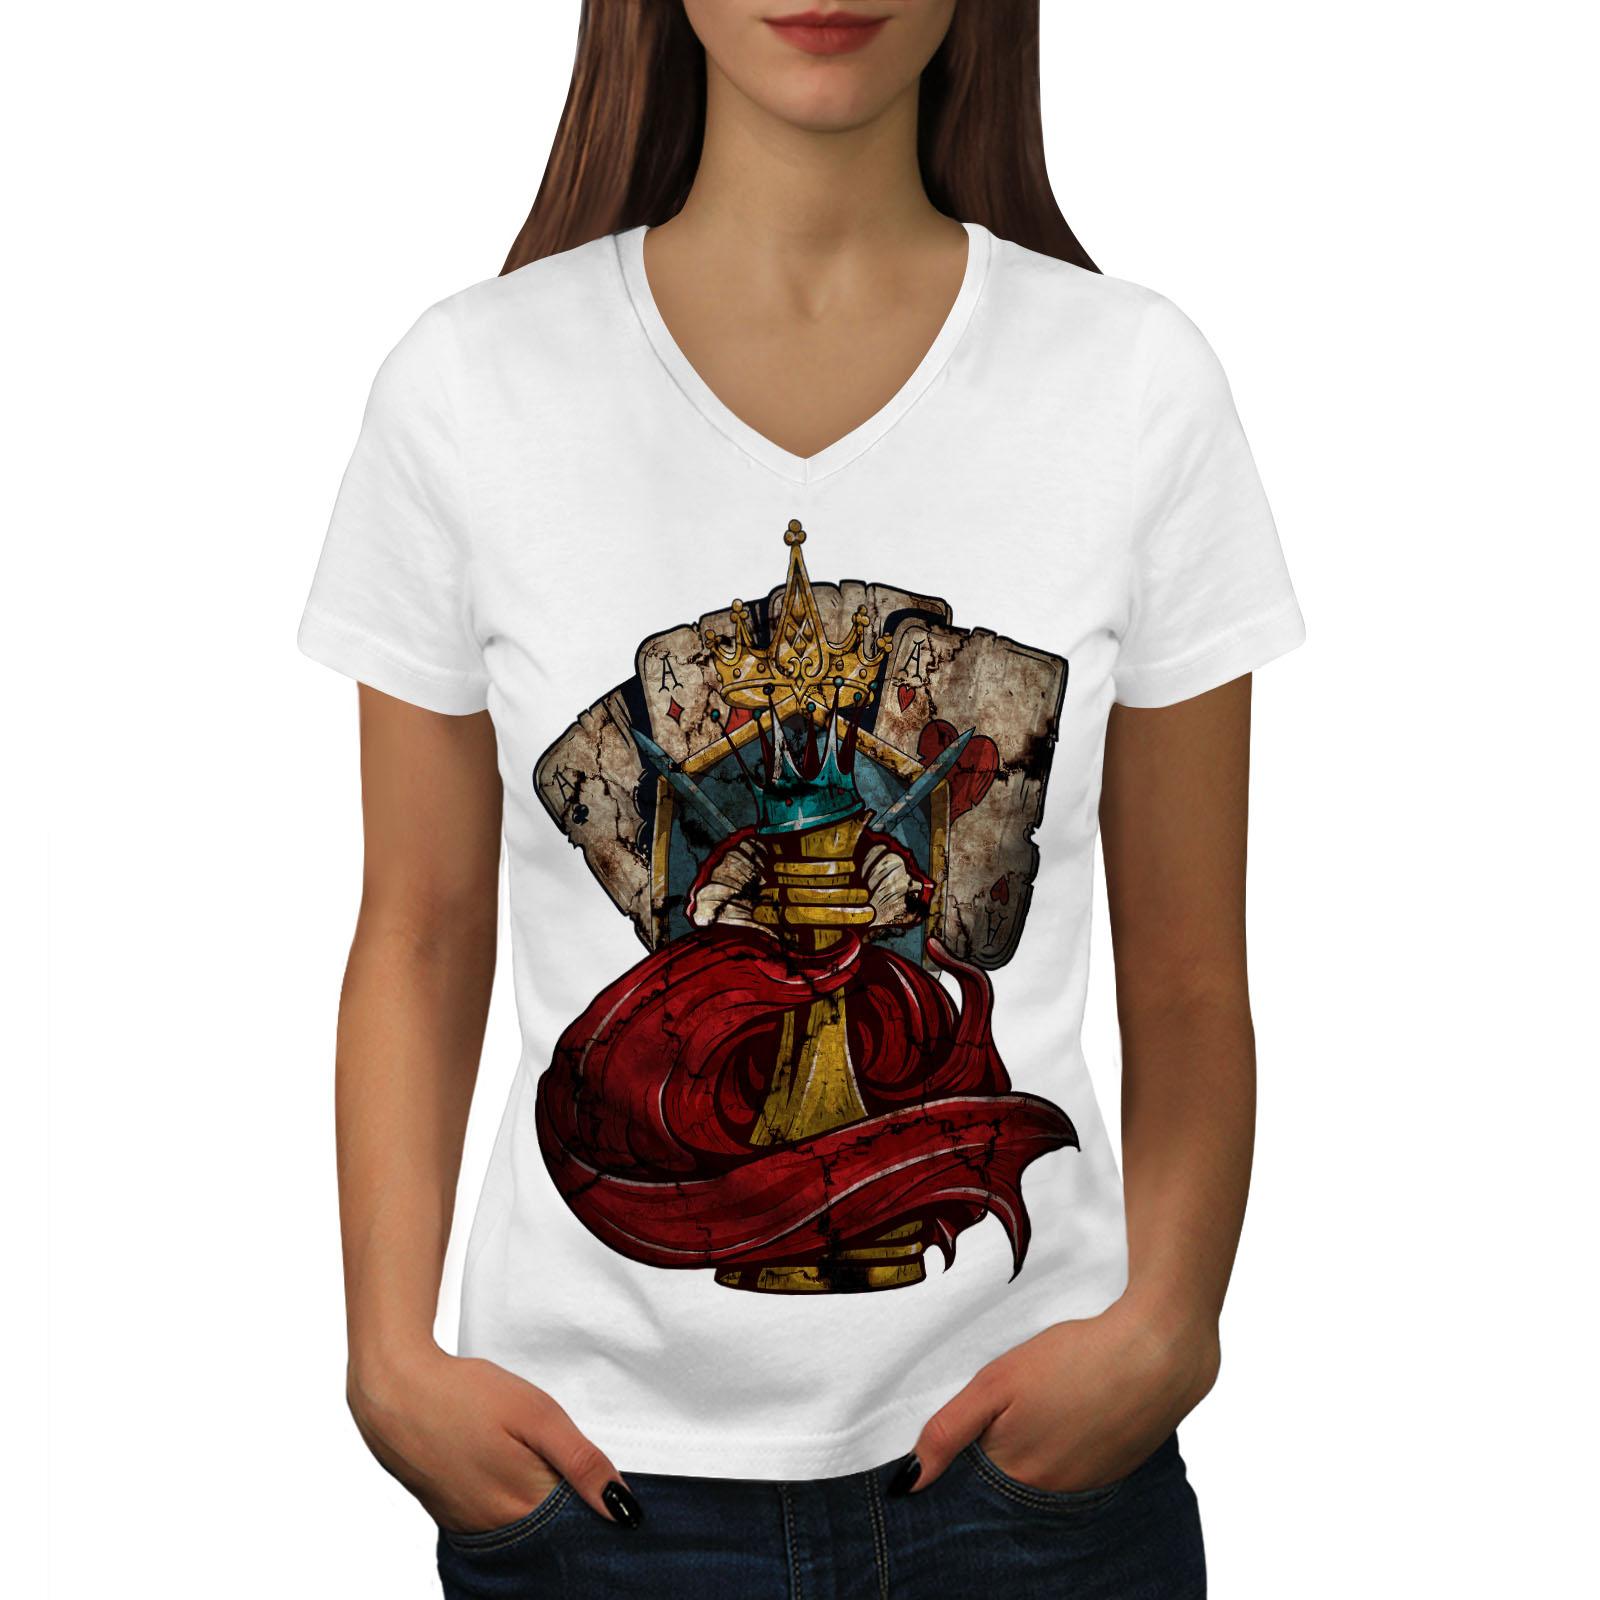 Queen Graphic Design Tee Wellcoda Chess Poker Card Gamble Womens V-Neck T-shirt